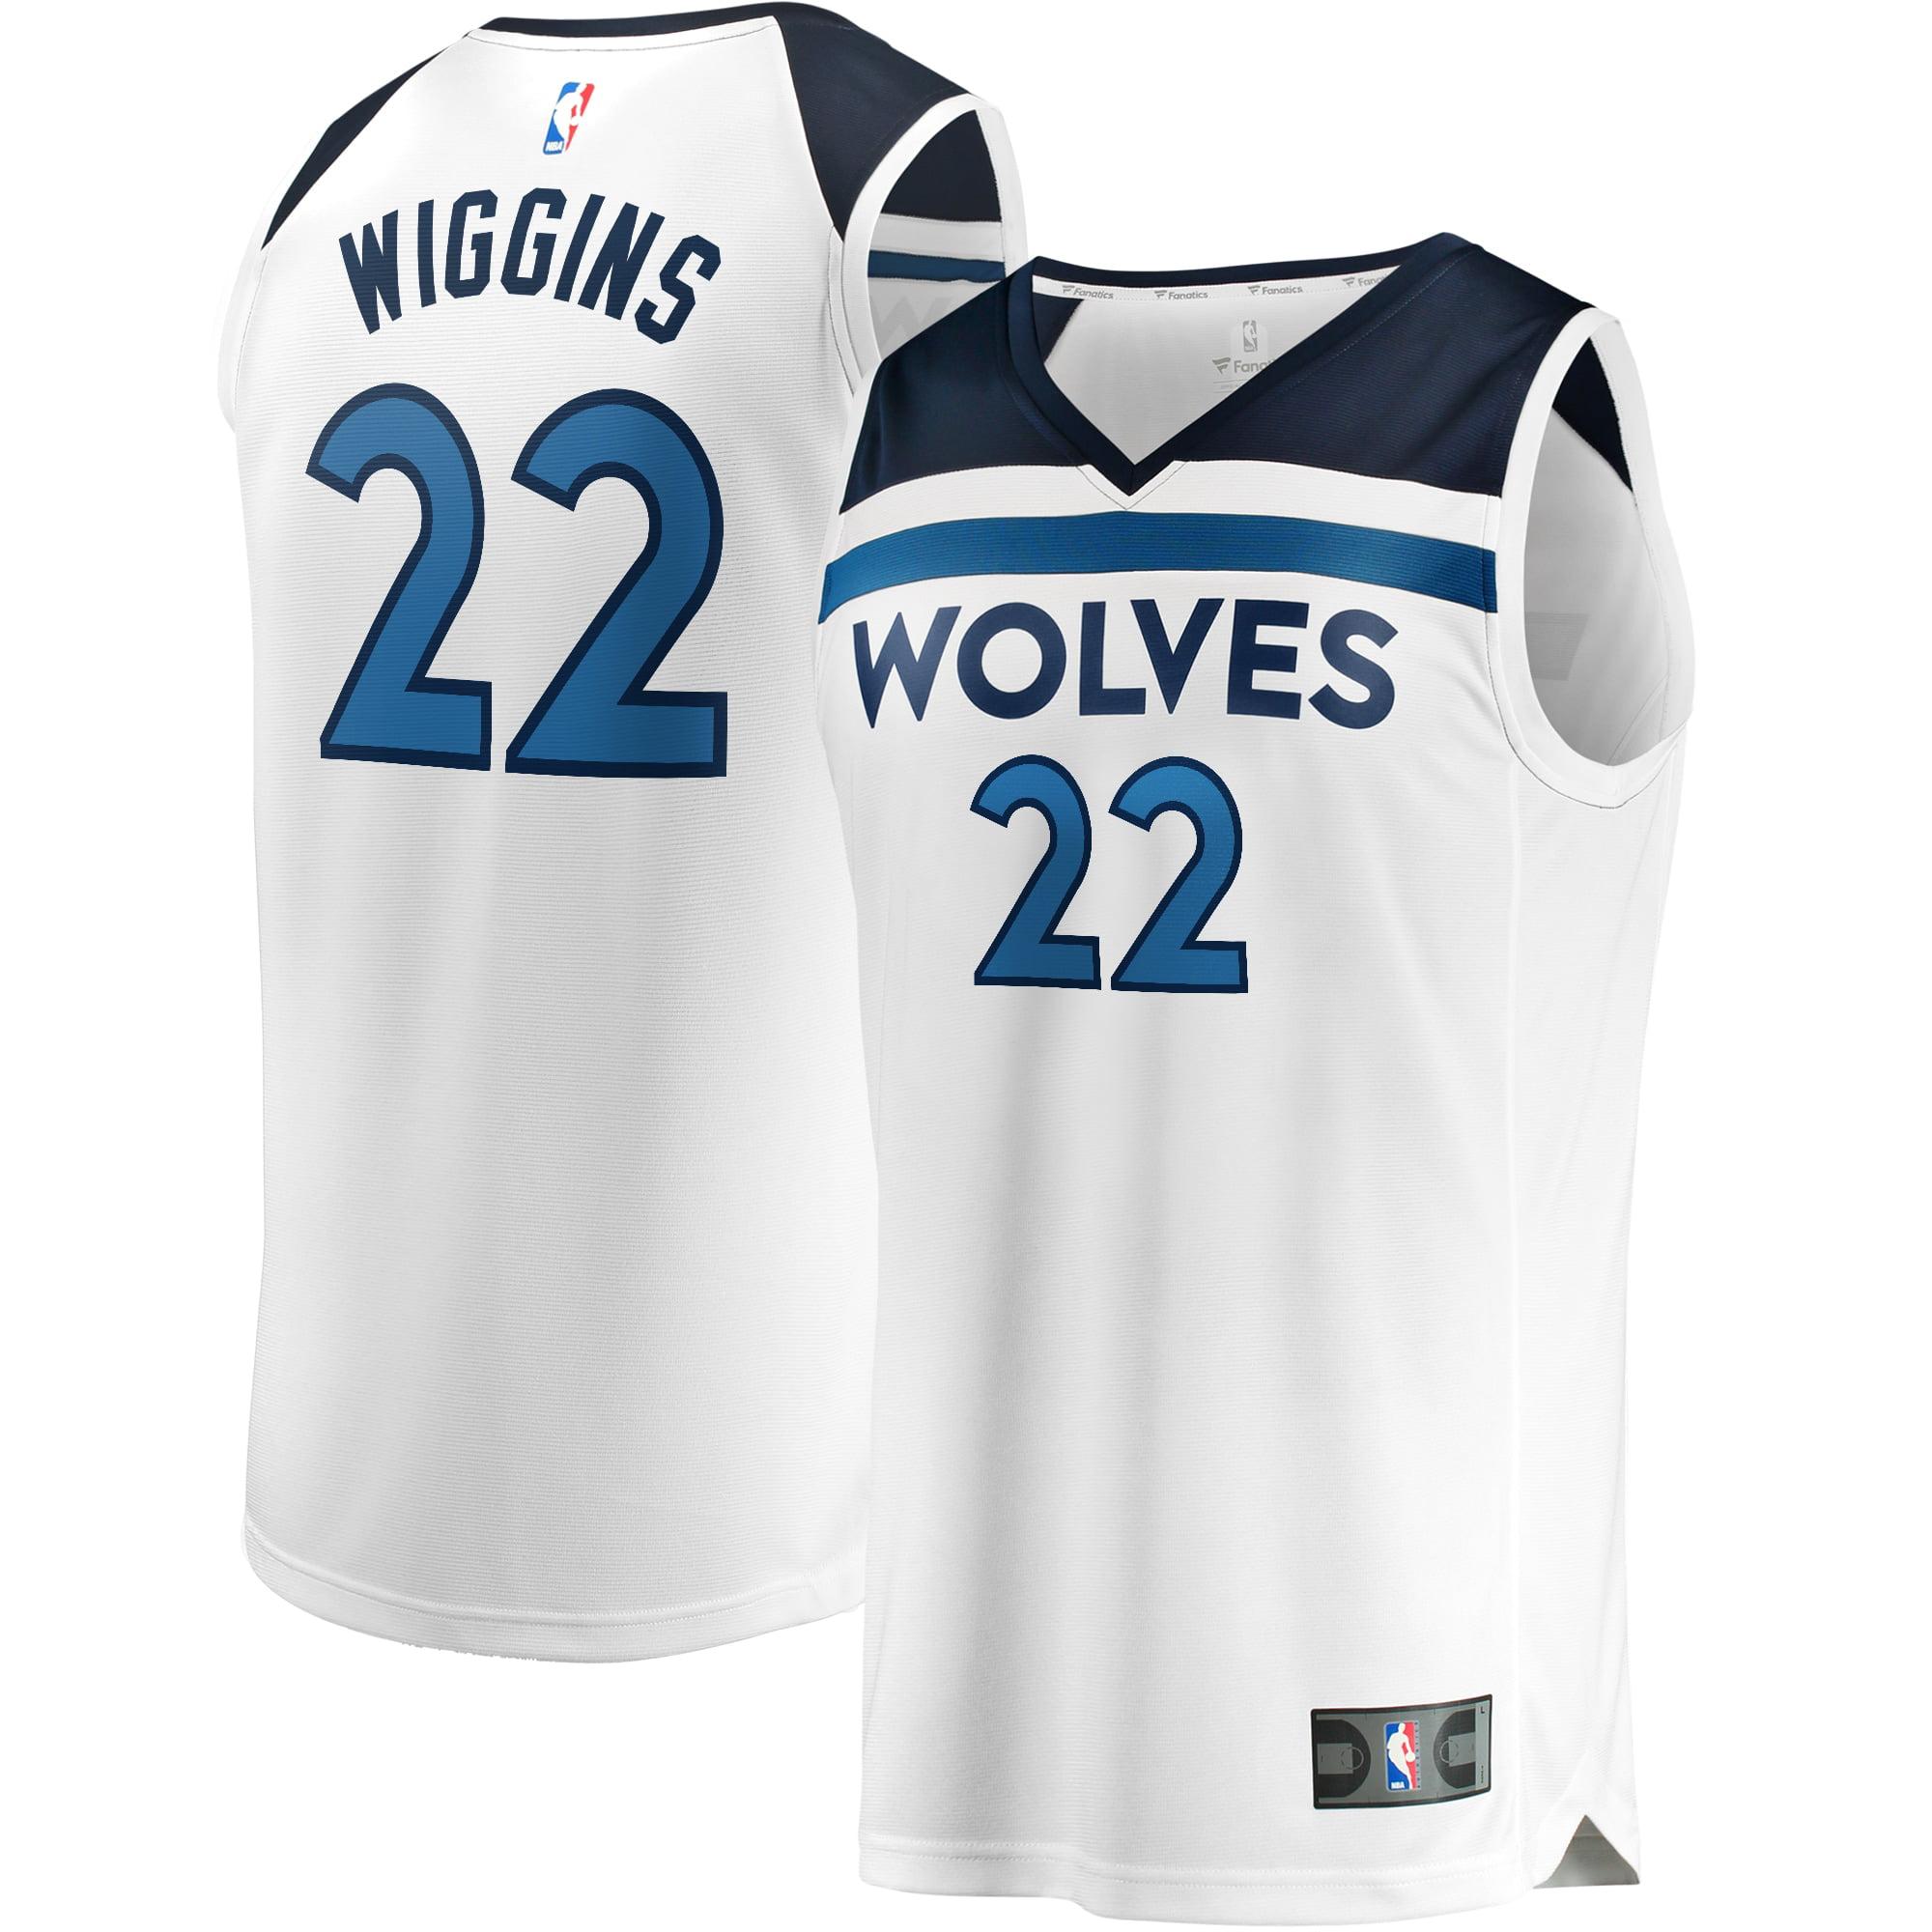 Andrew Wiggins Minnesota Timberwolves Fanatics Branded Youth Fast Break Replica Player Jersey - Association Edition - - Walmart.com